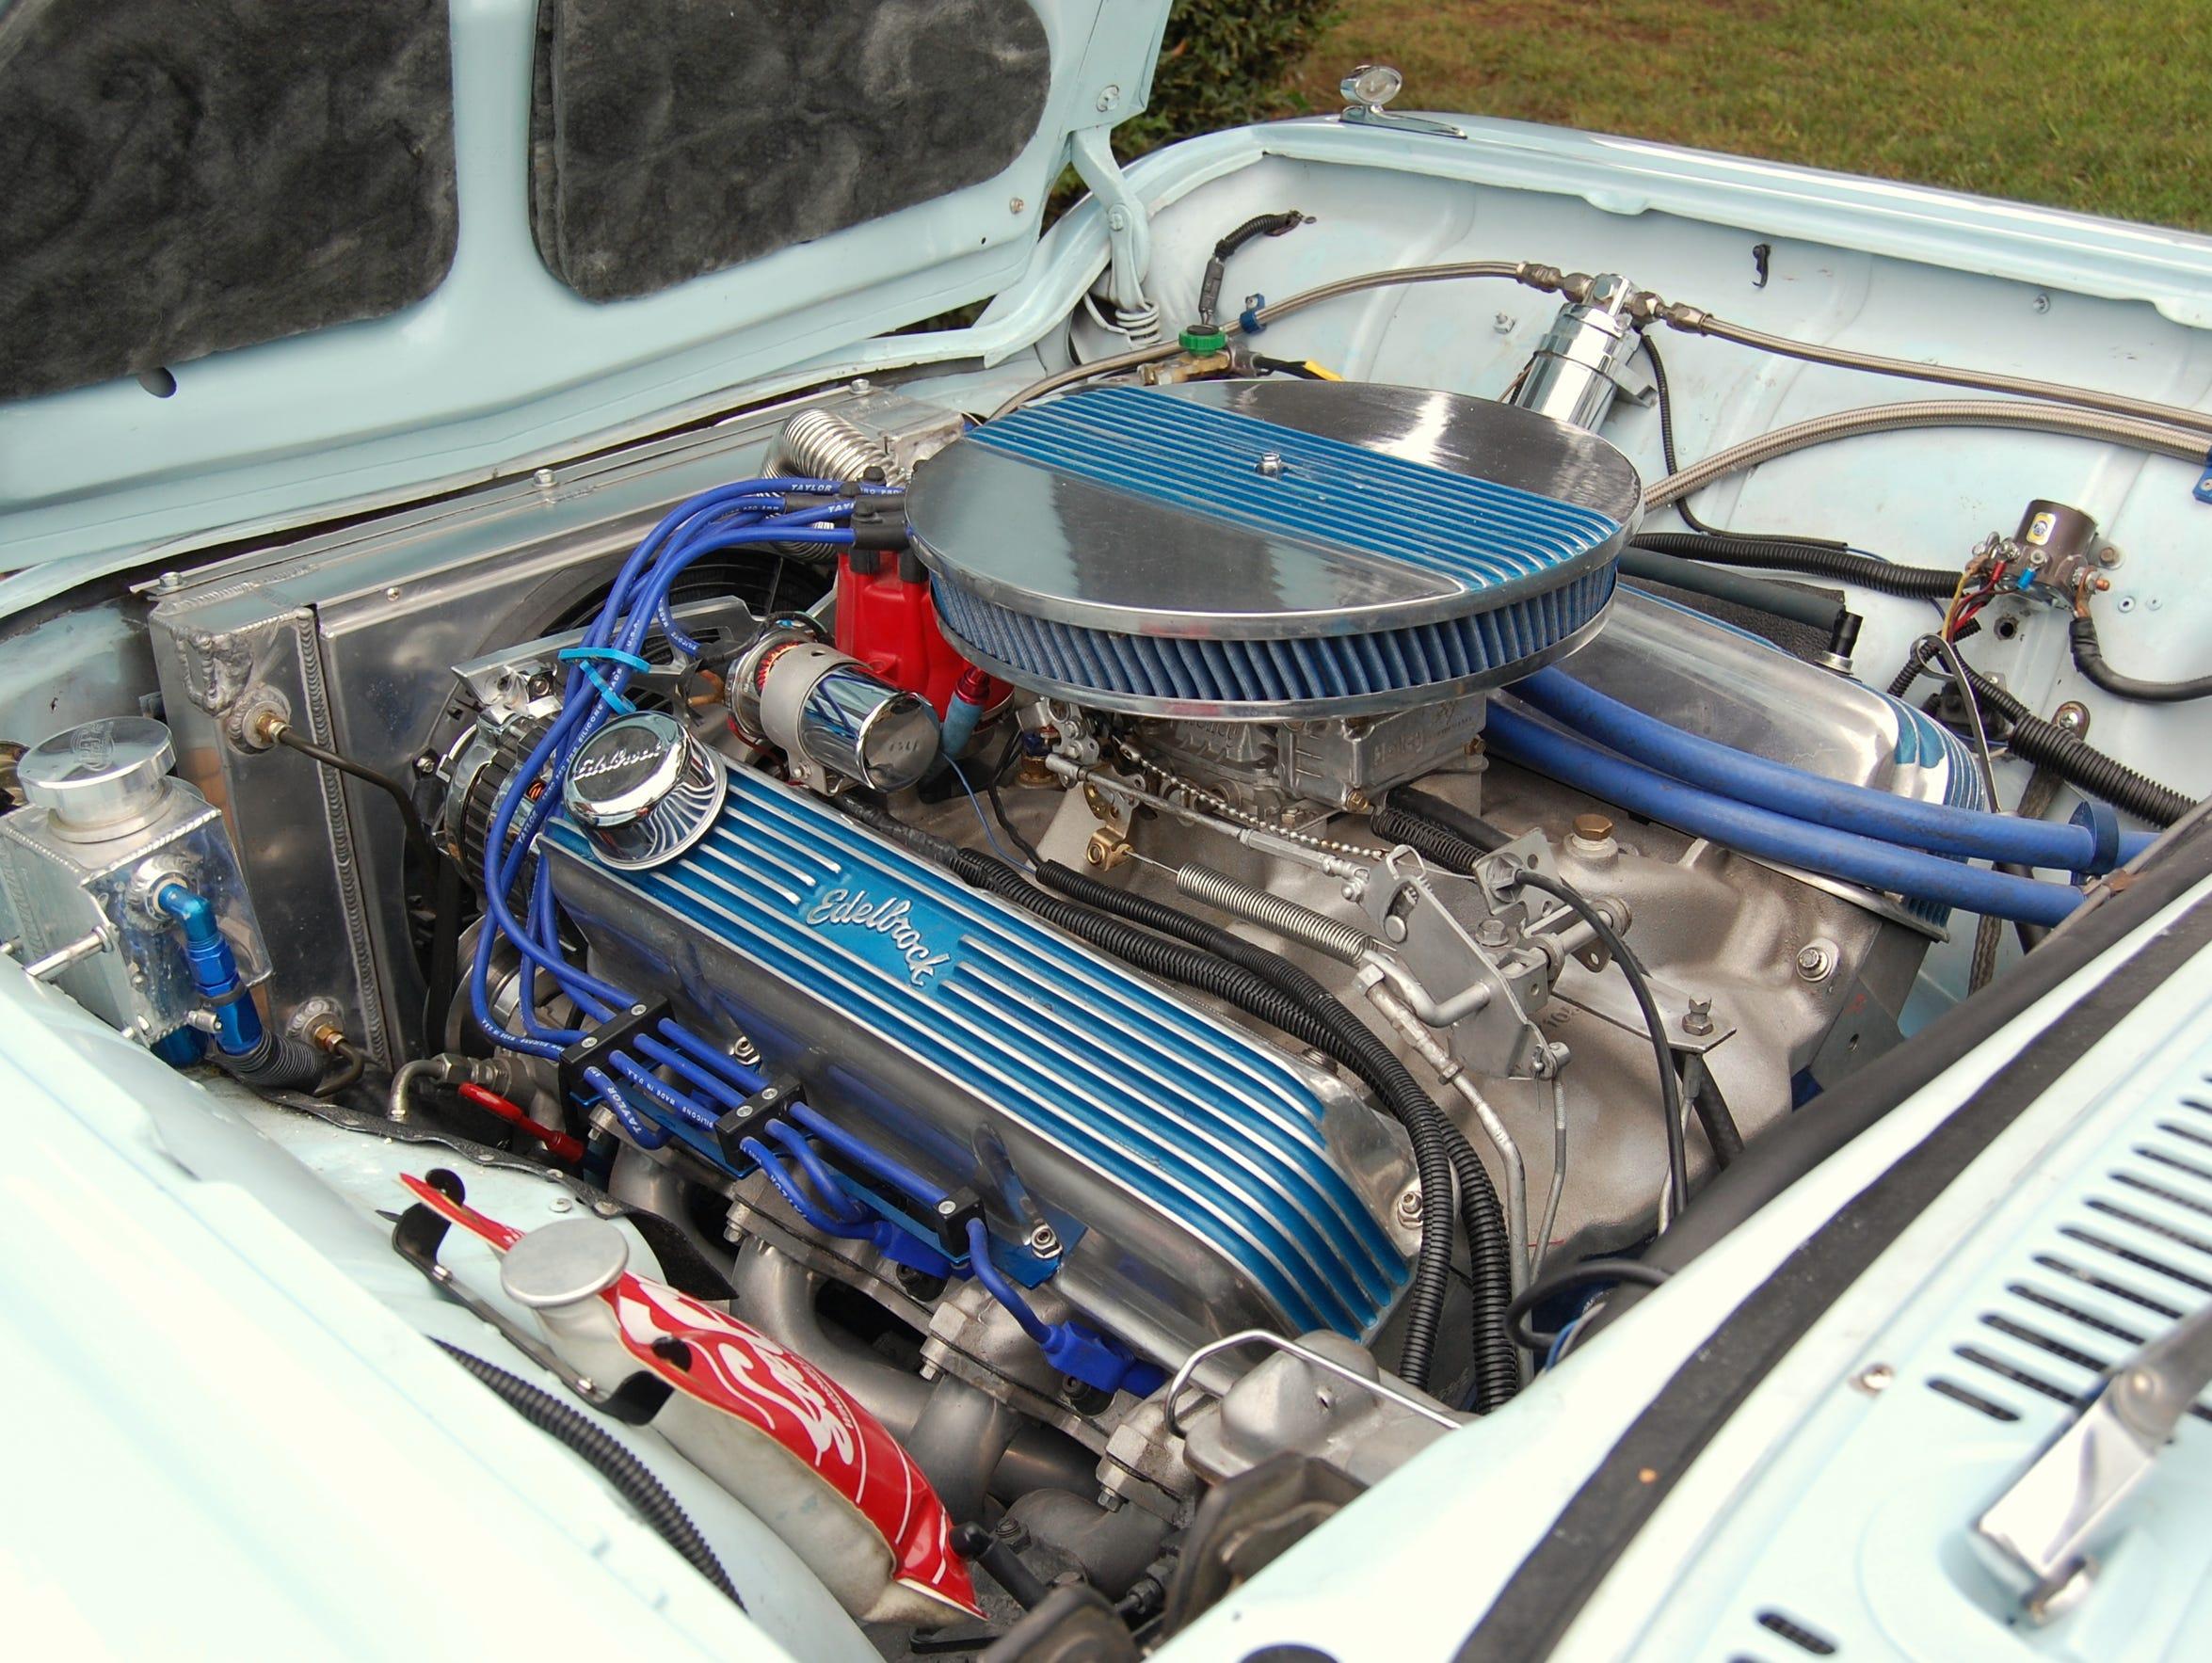 VERNON – The newly installed engine in Baldwin's Thunderbird